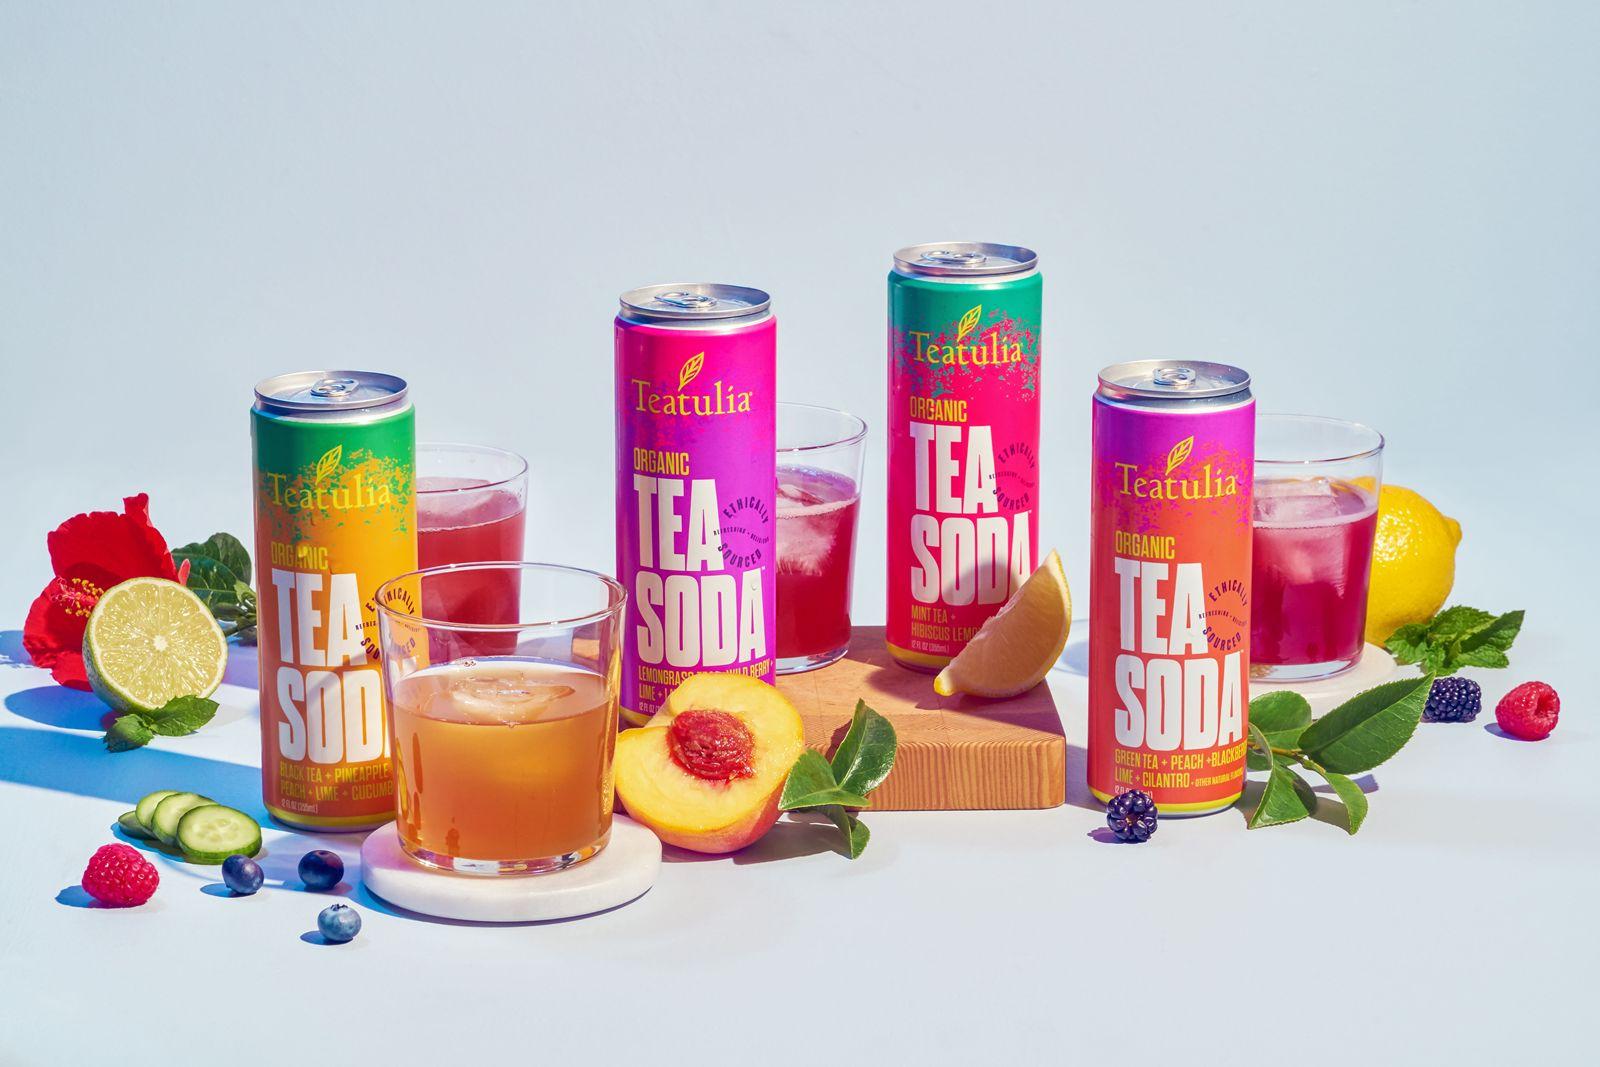 Teatulia is Shaking Up the Tea Category